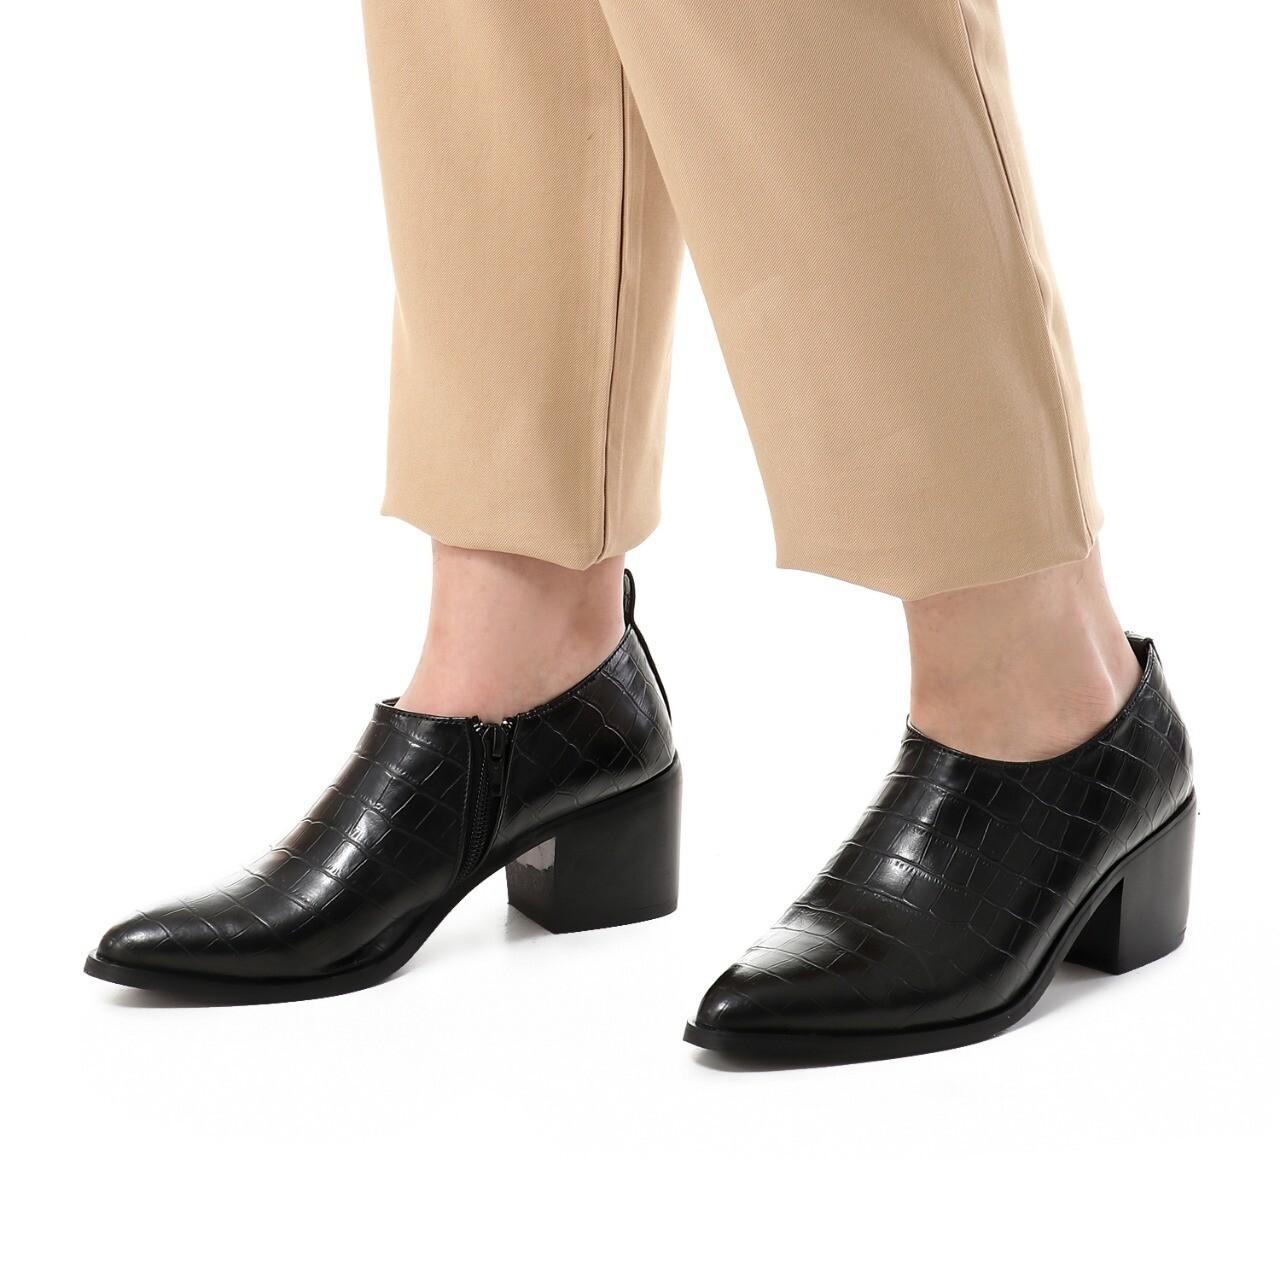 3742 Shoes - Black Crocodile